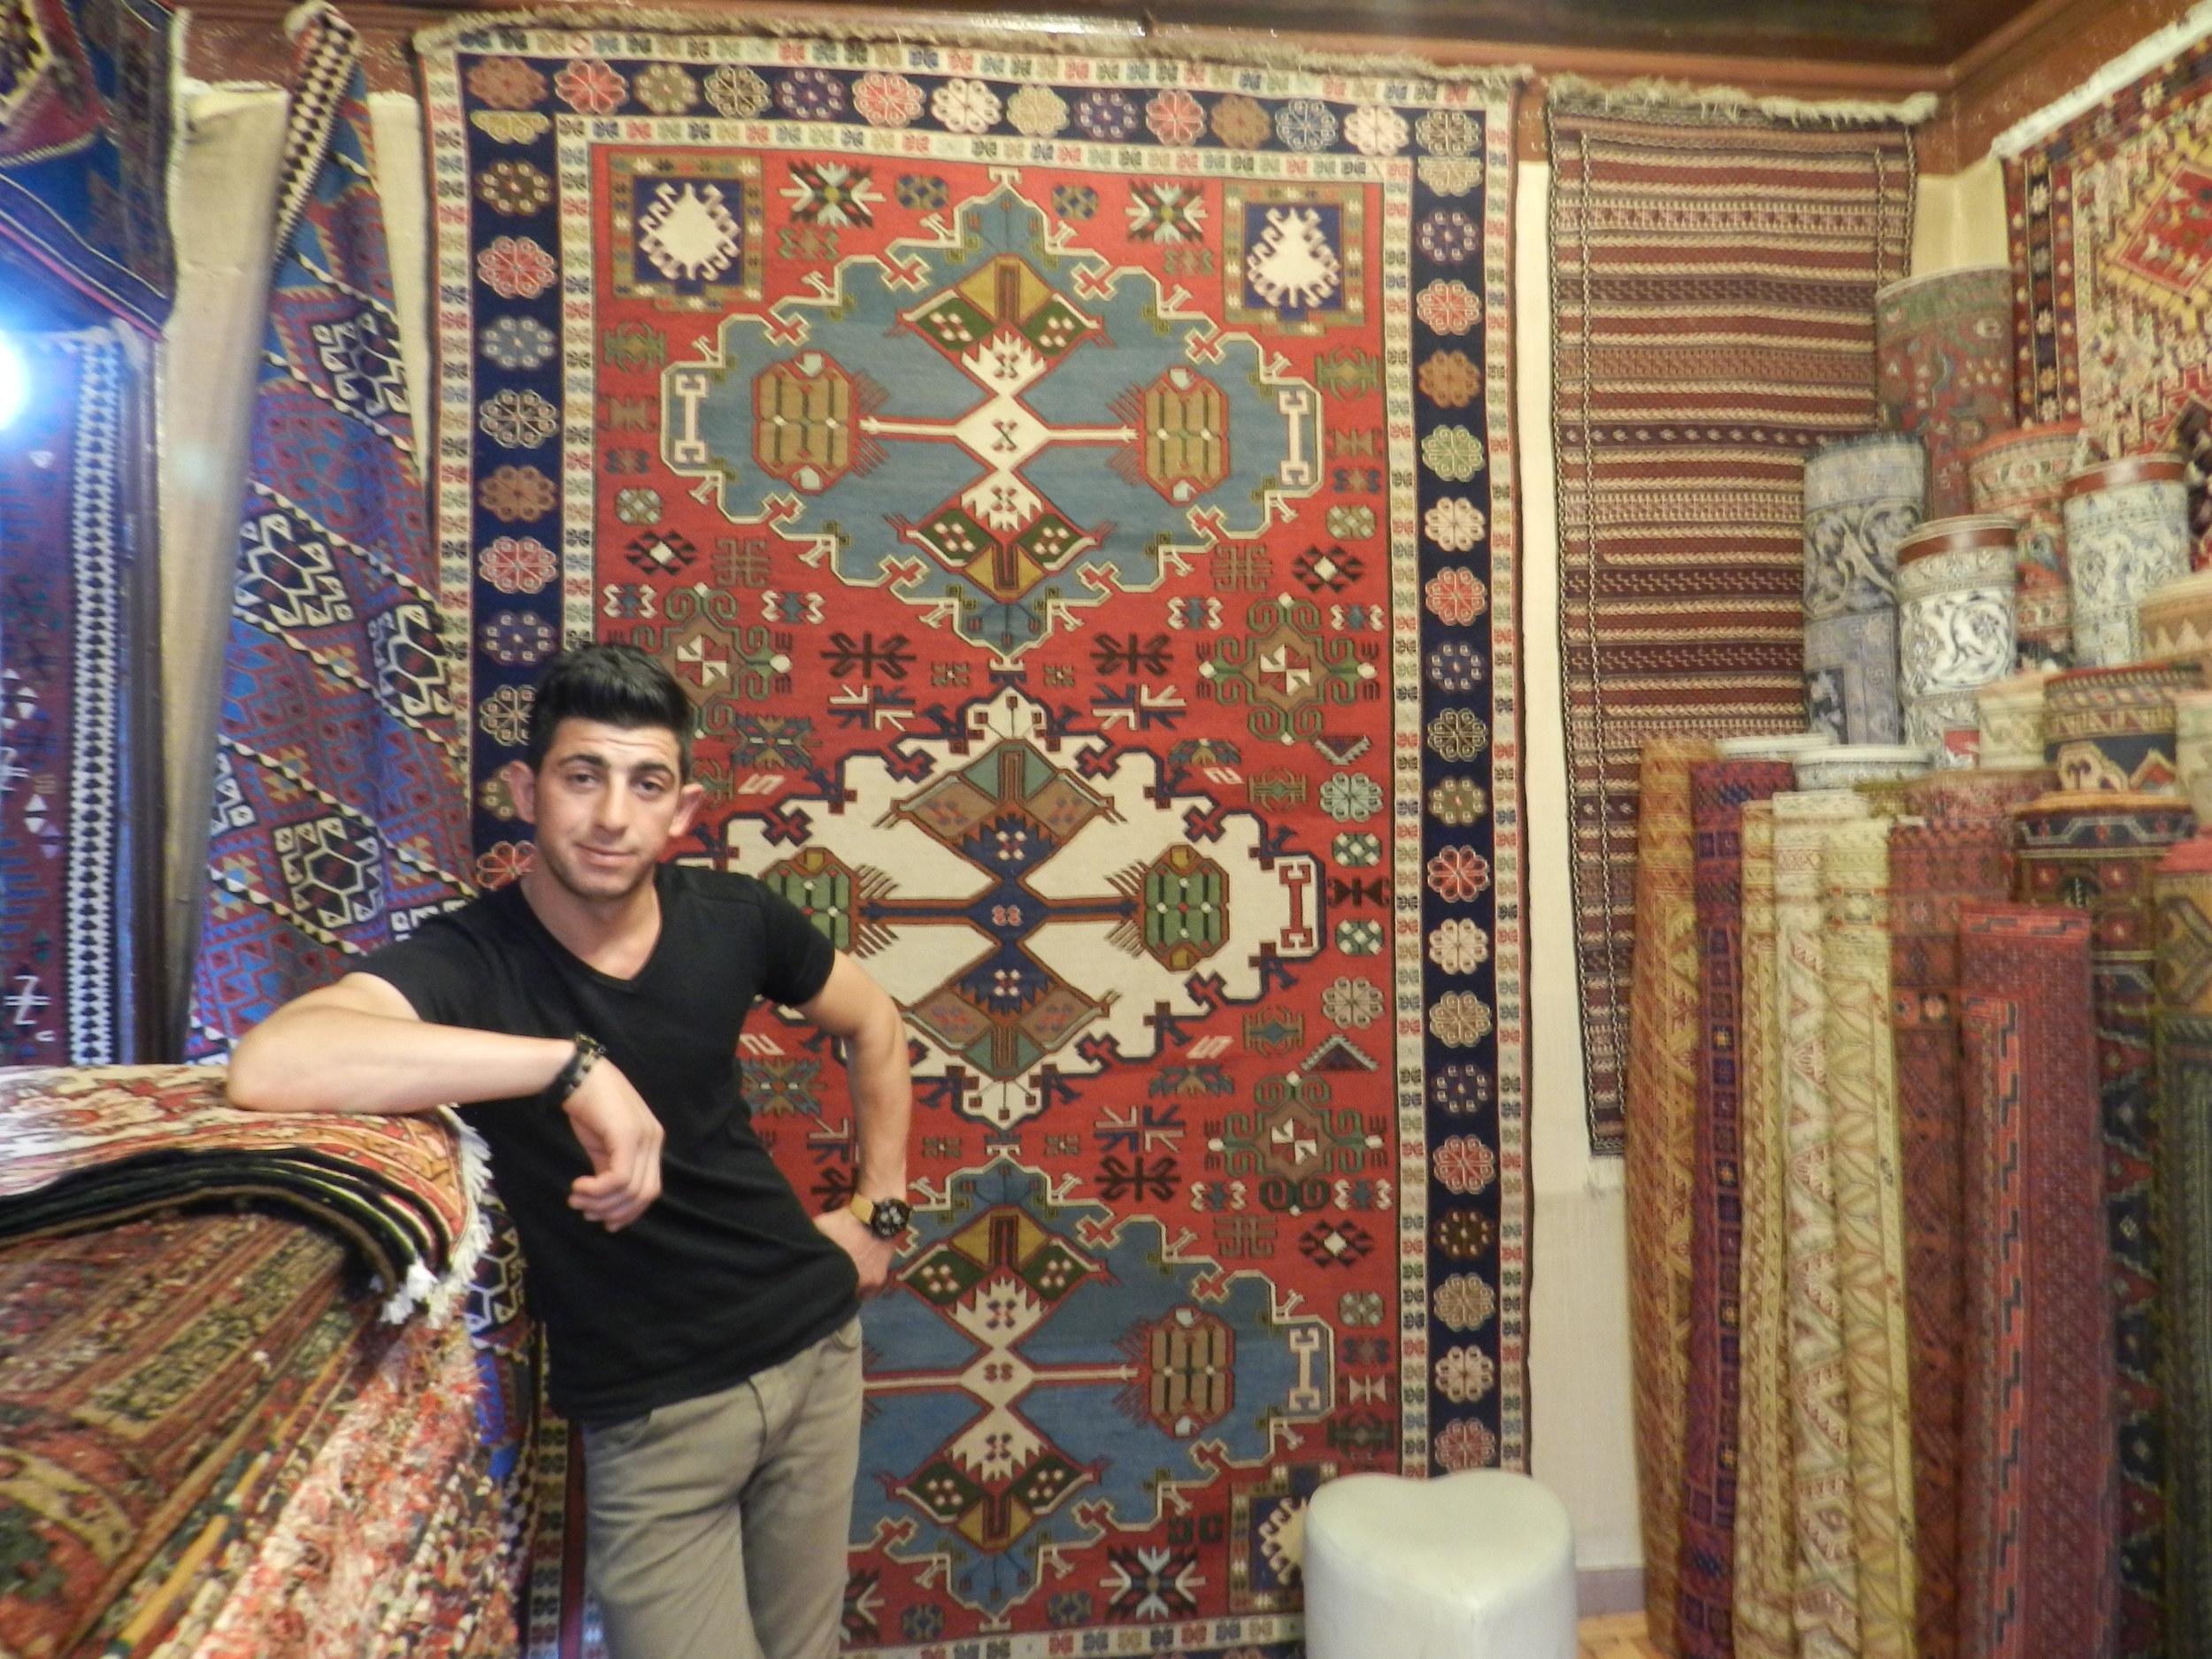 Saddam posing with his tapestries